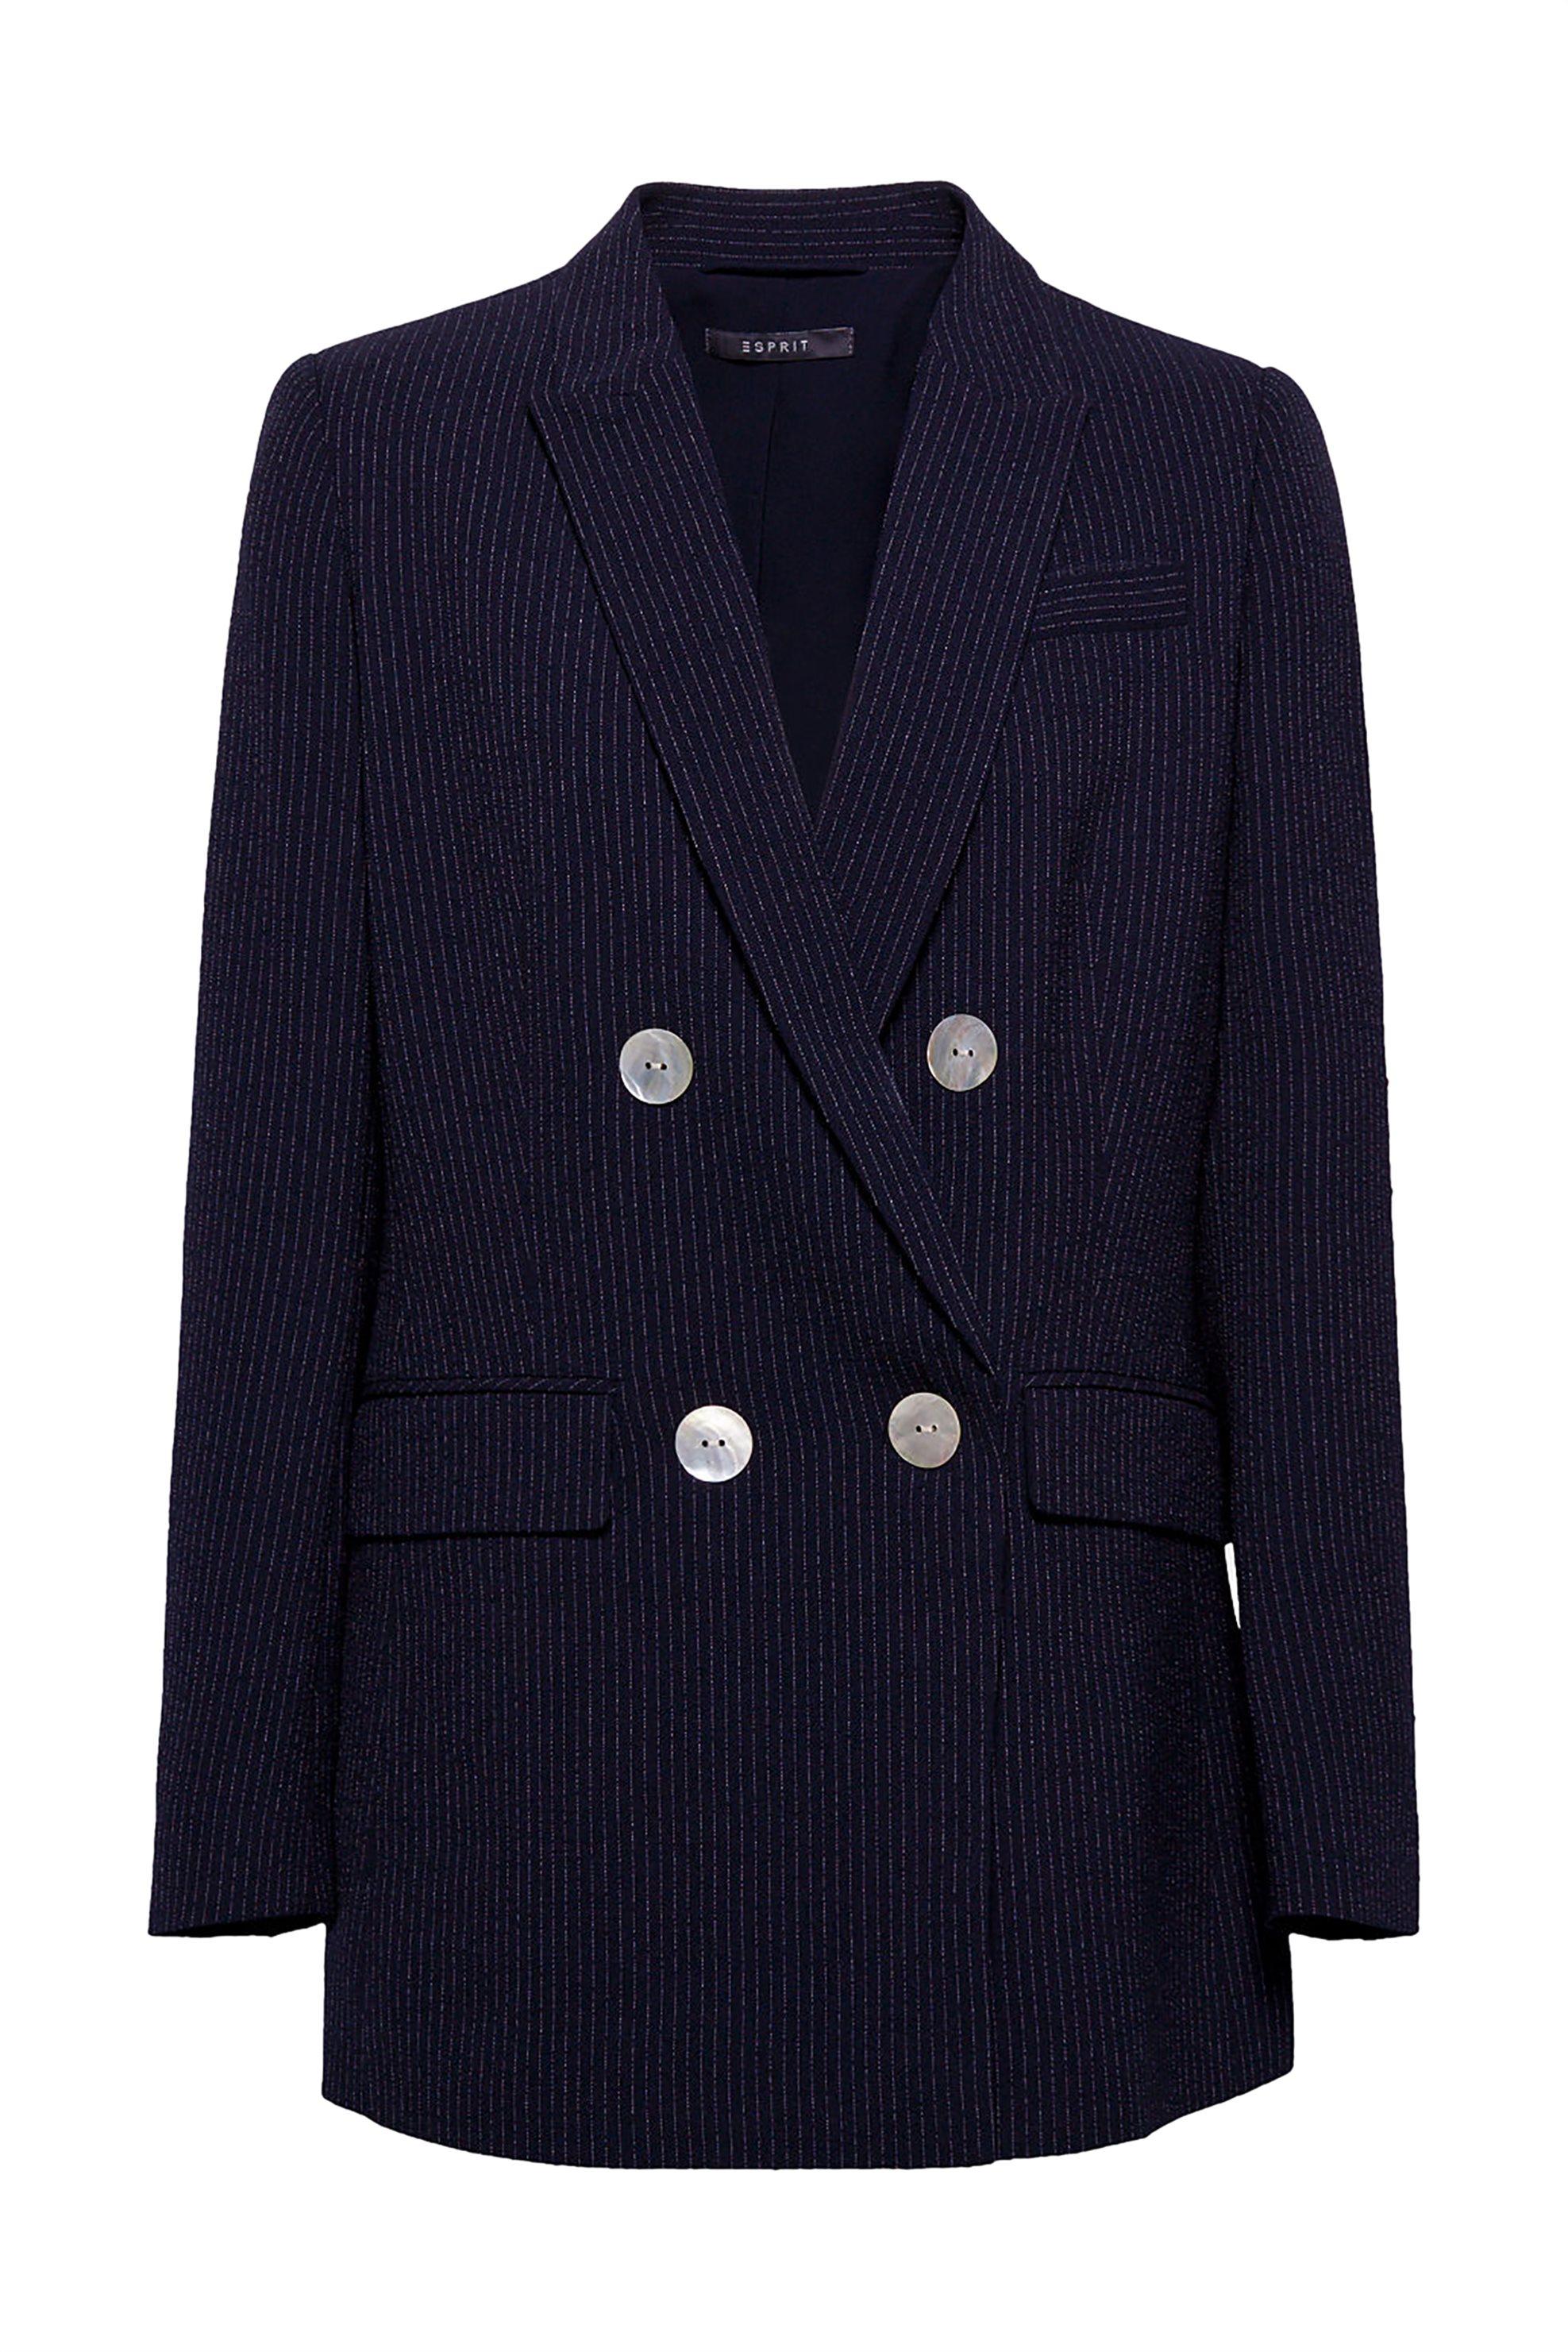 ccaa509ca8bd Notos Esprit γυναικείο σακάκι με λεπτές ρίγες και κουμπιά φίλντισι -  029EO1G004 - Μπλε Σκούρο